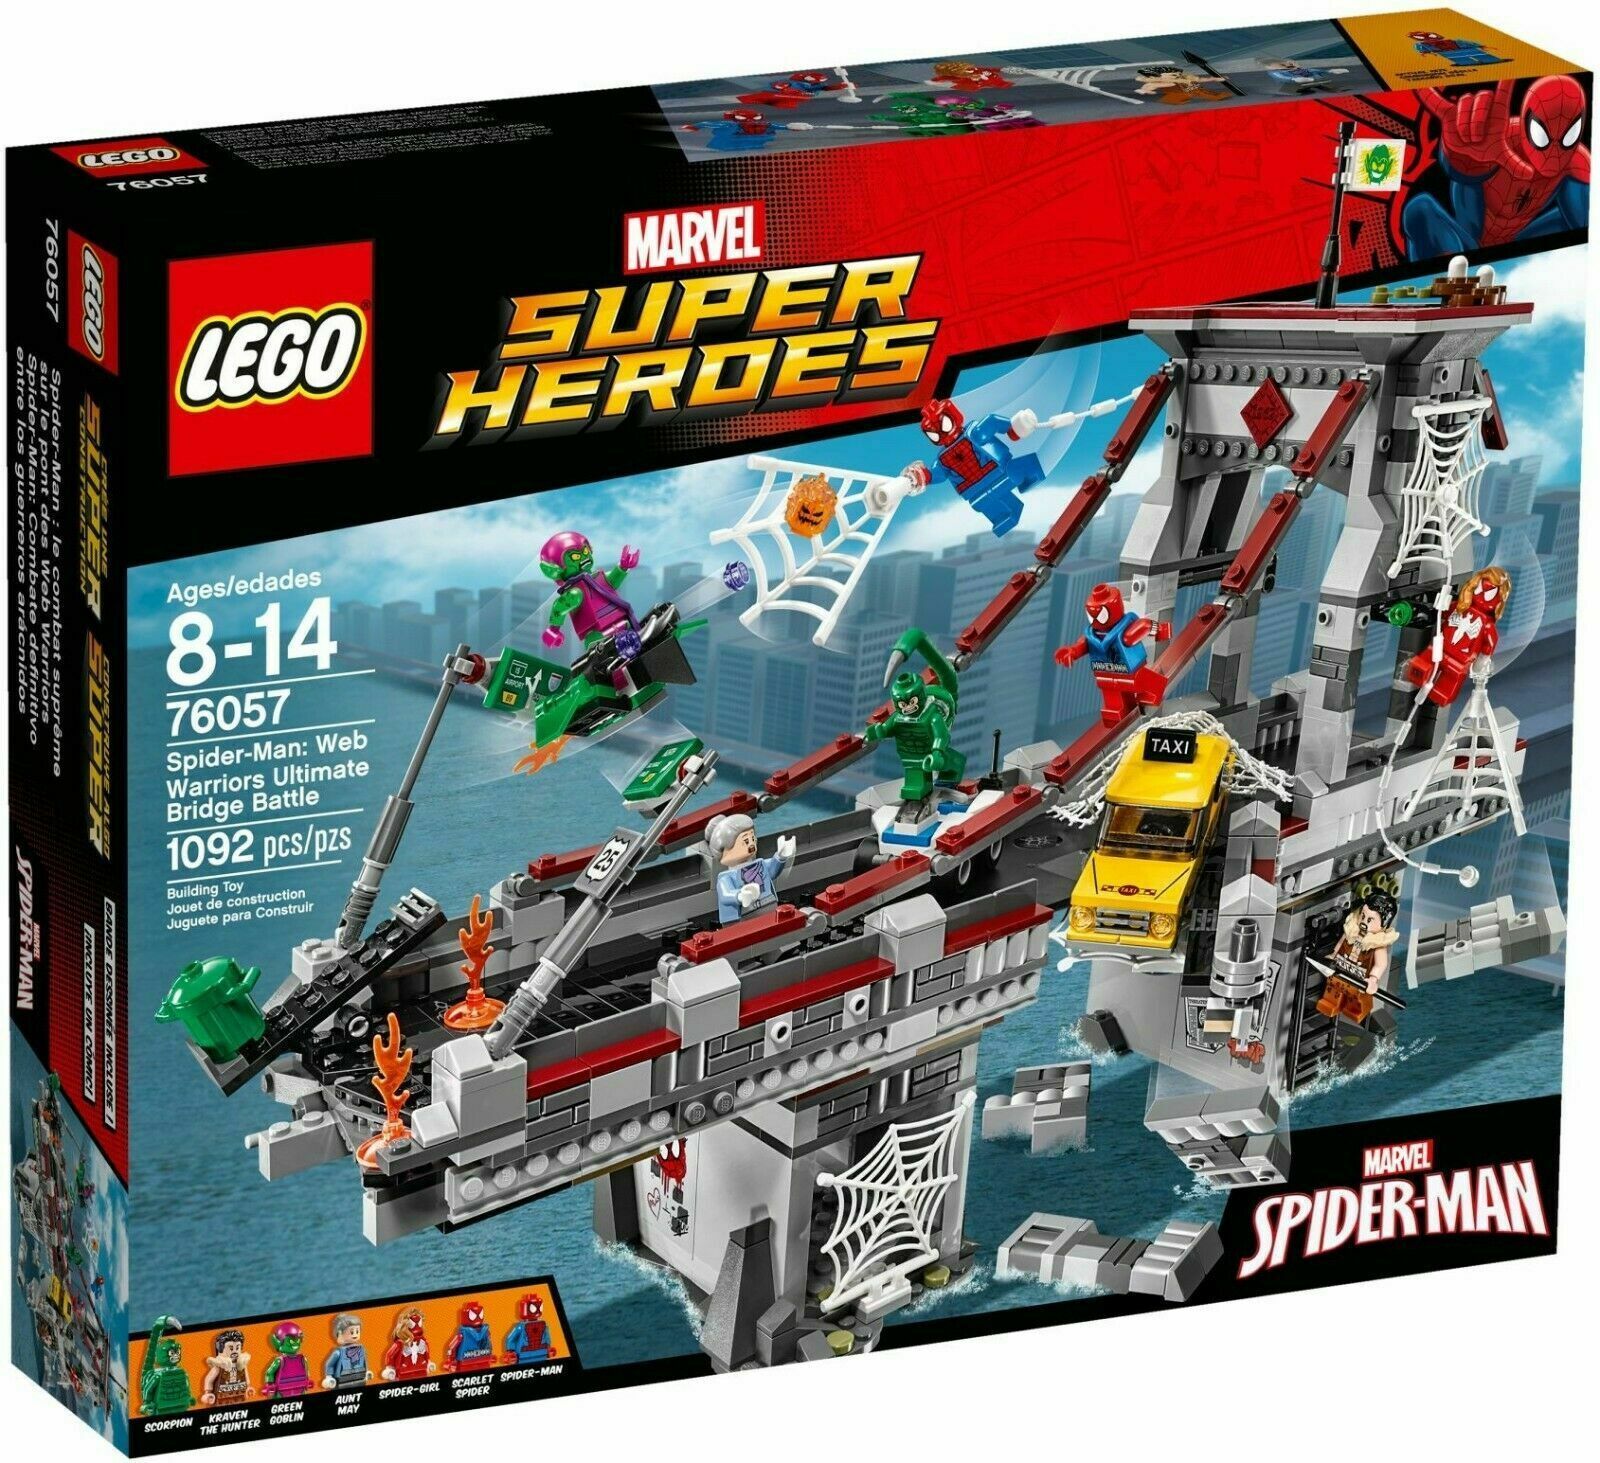 Marvel Spider Man Bridge Battle - Lego 76057 - Sealed Box - 1092 Pieces -Retirojo